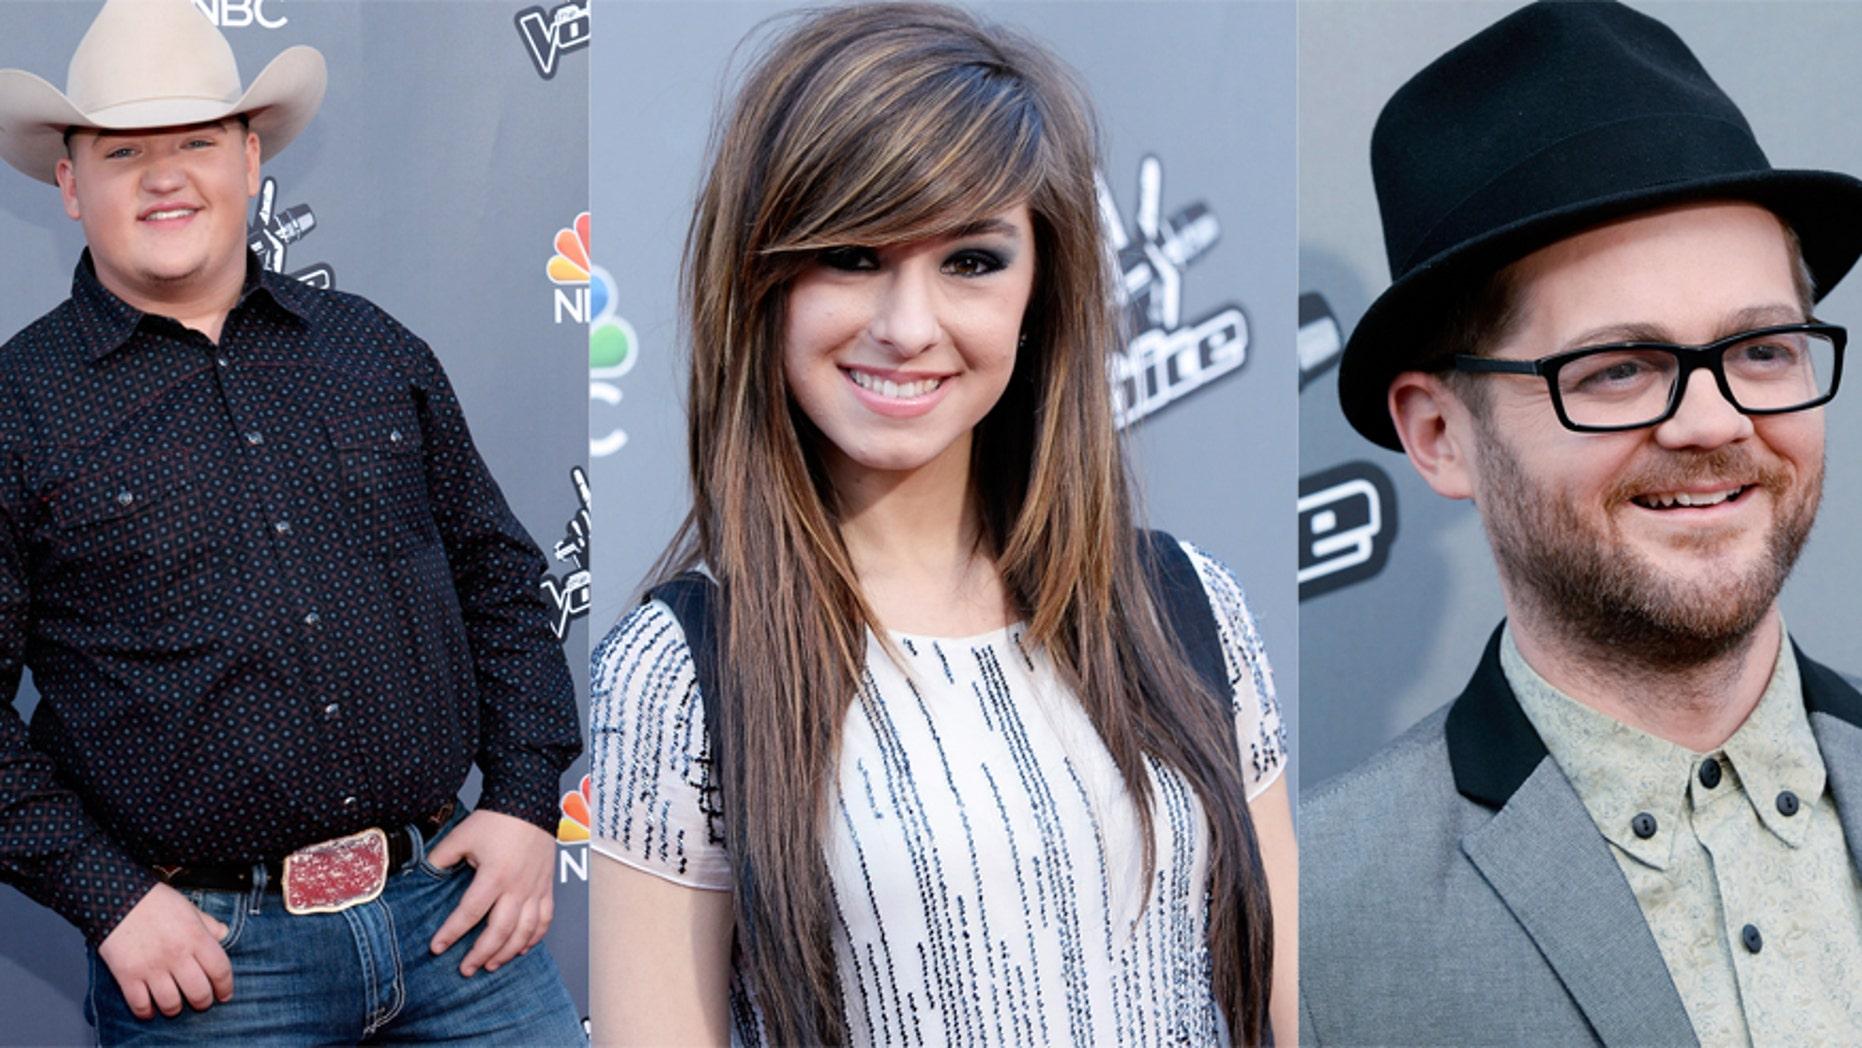 The top 3 'Voice' finalists: Team Blake's Jake Worthington (L), team Adam's  Christina Grimmie (C) and team Usher's Josh Kaufman.